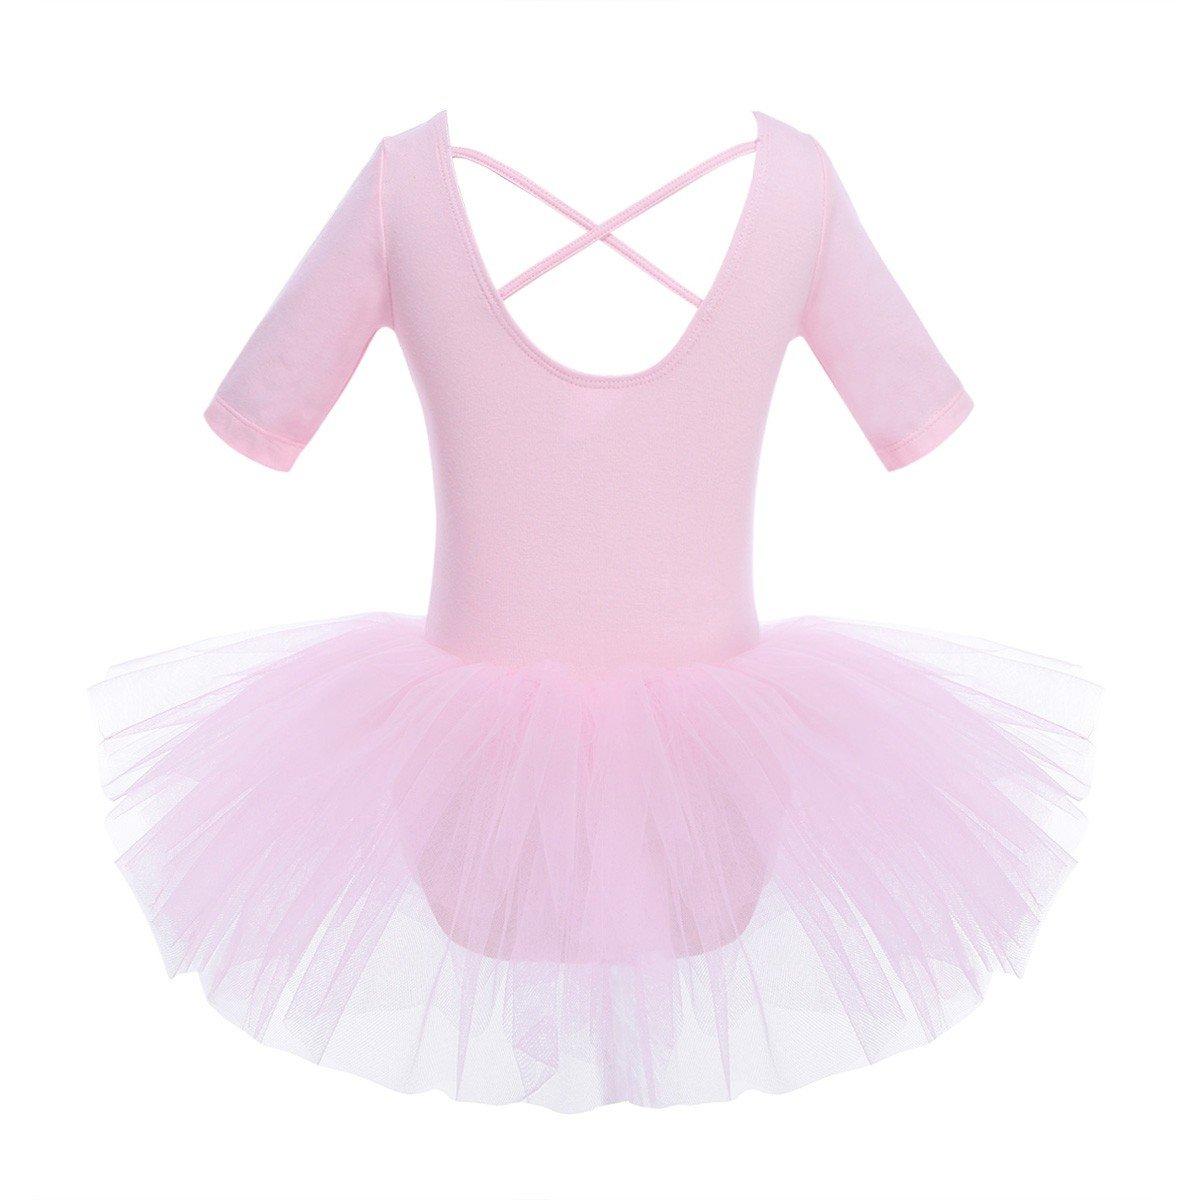 YiZYiF Kids Girl's Short Sleeved Gymnastics Ballet Dance Leotard Dress Cross Back Design